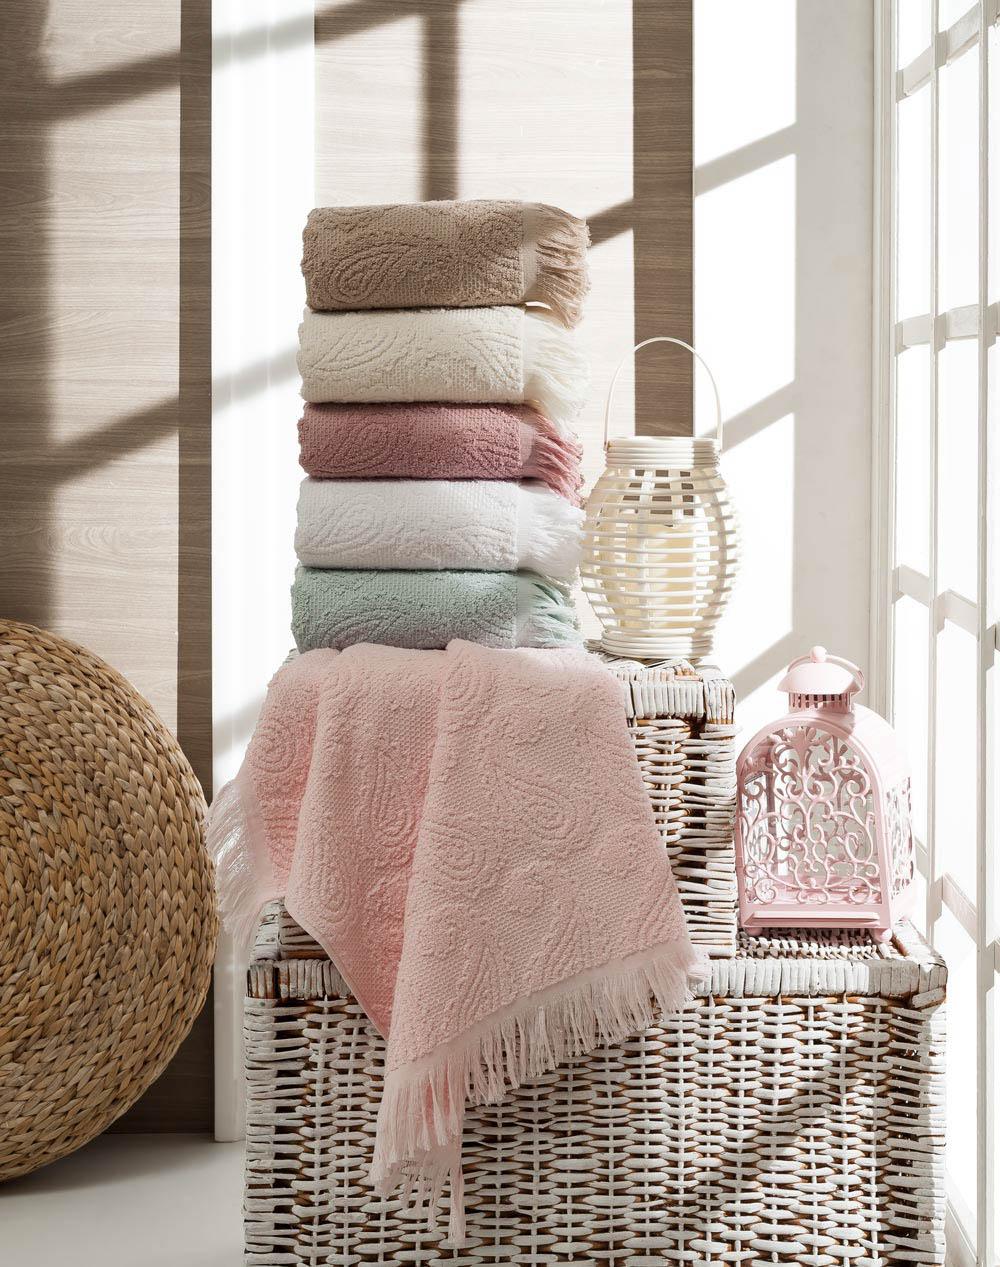 Полотенца Arya Полотенце Misley Цвет: Белый (70х140 см) полотенца arya полотенце apollo цвет пурпурный 70х140 см